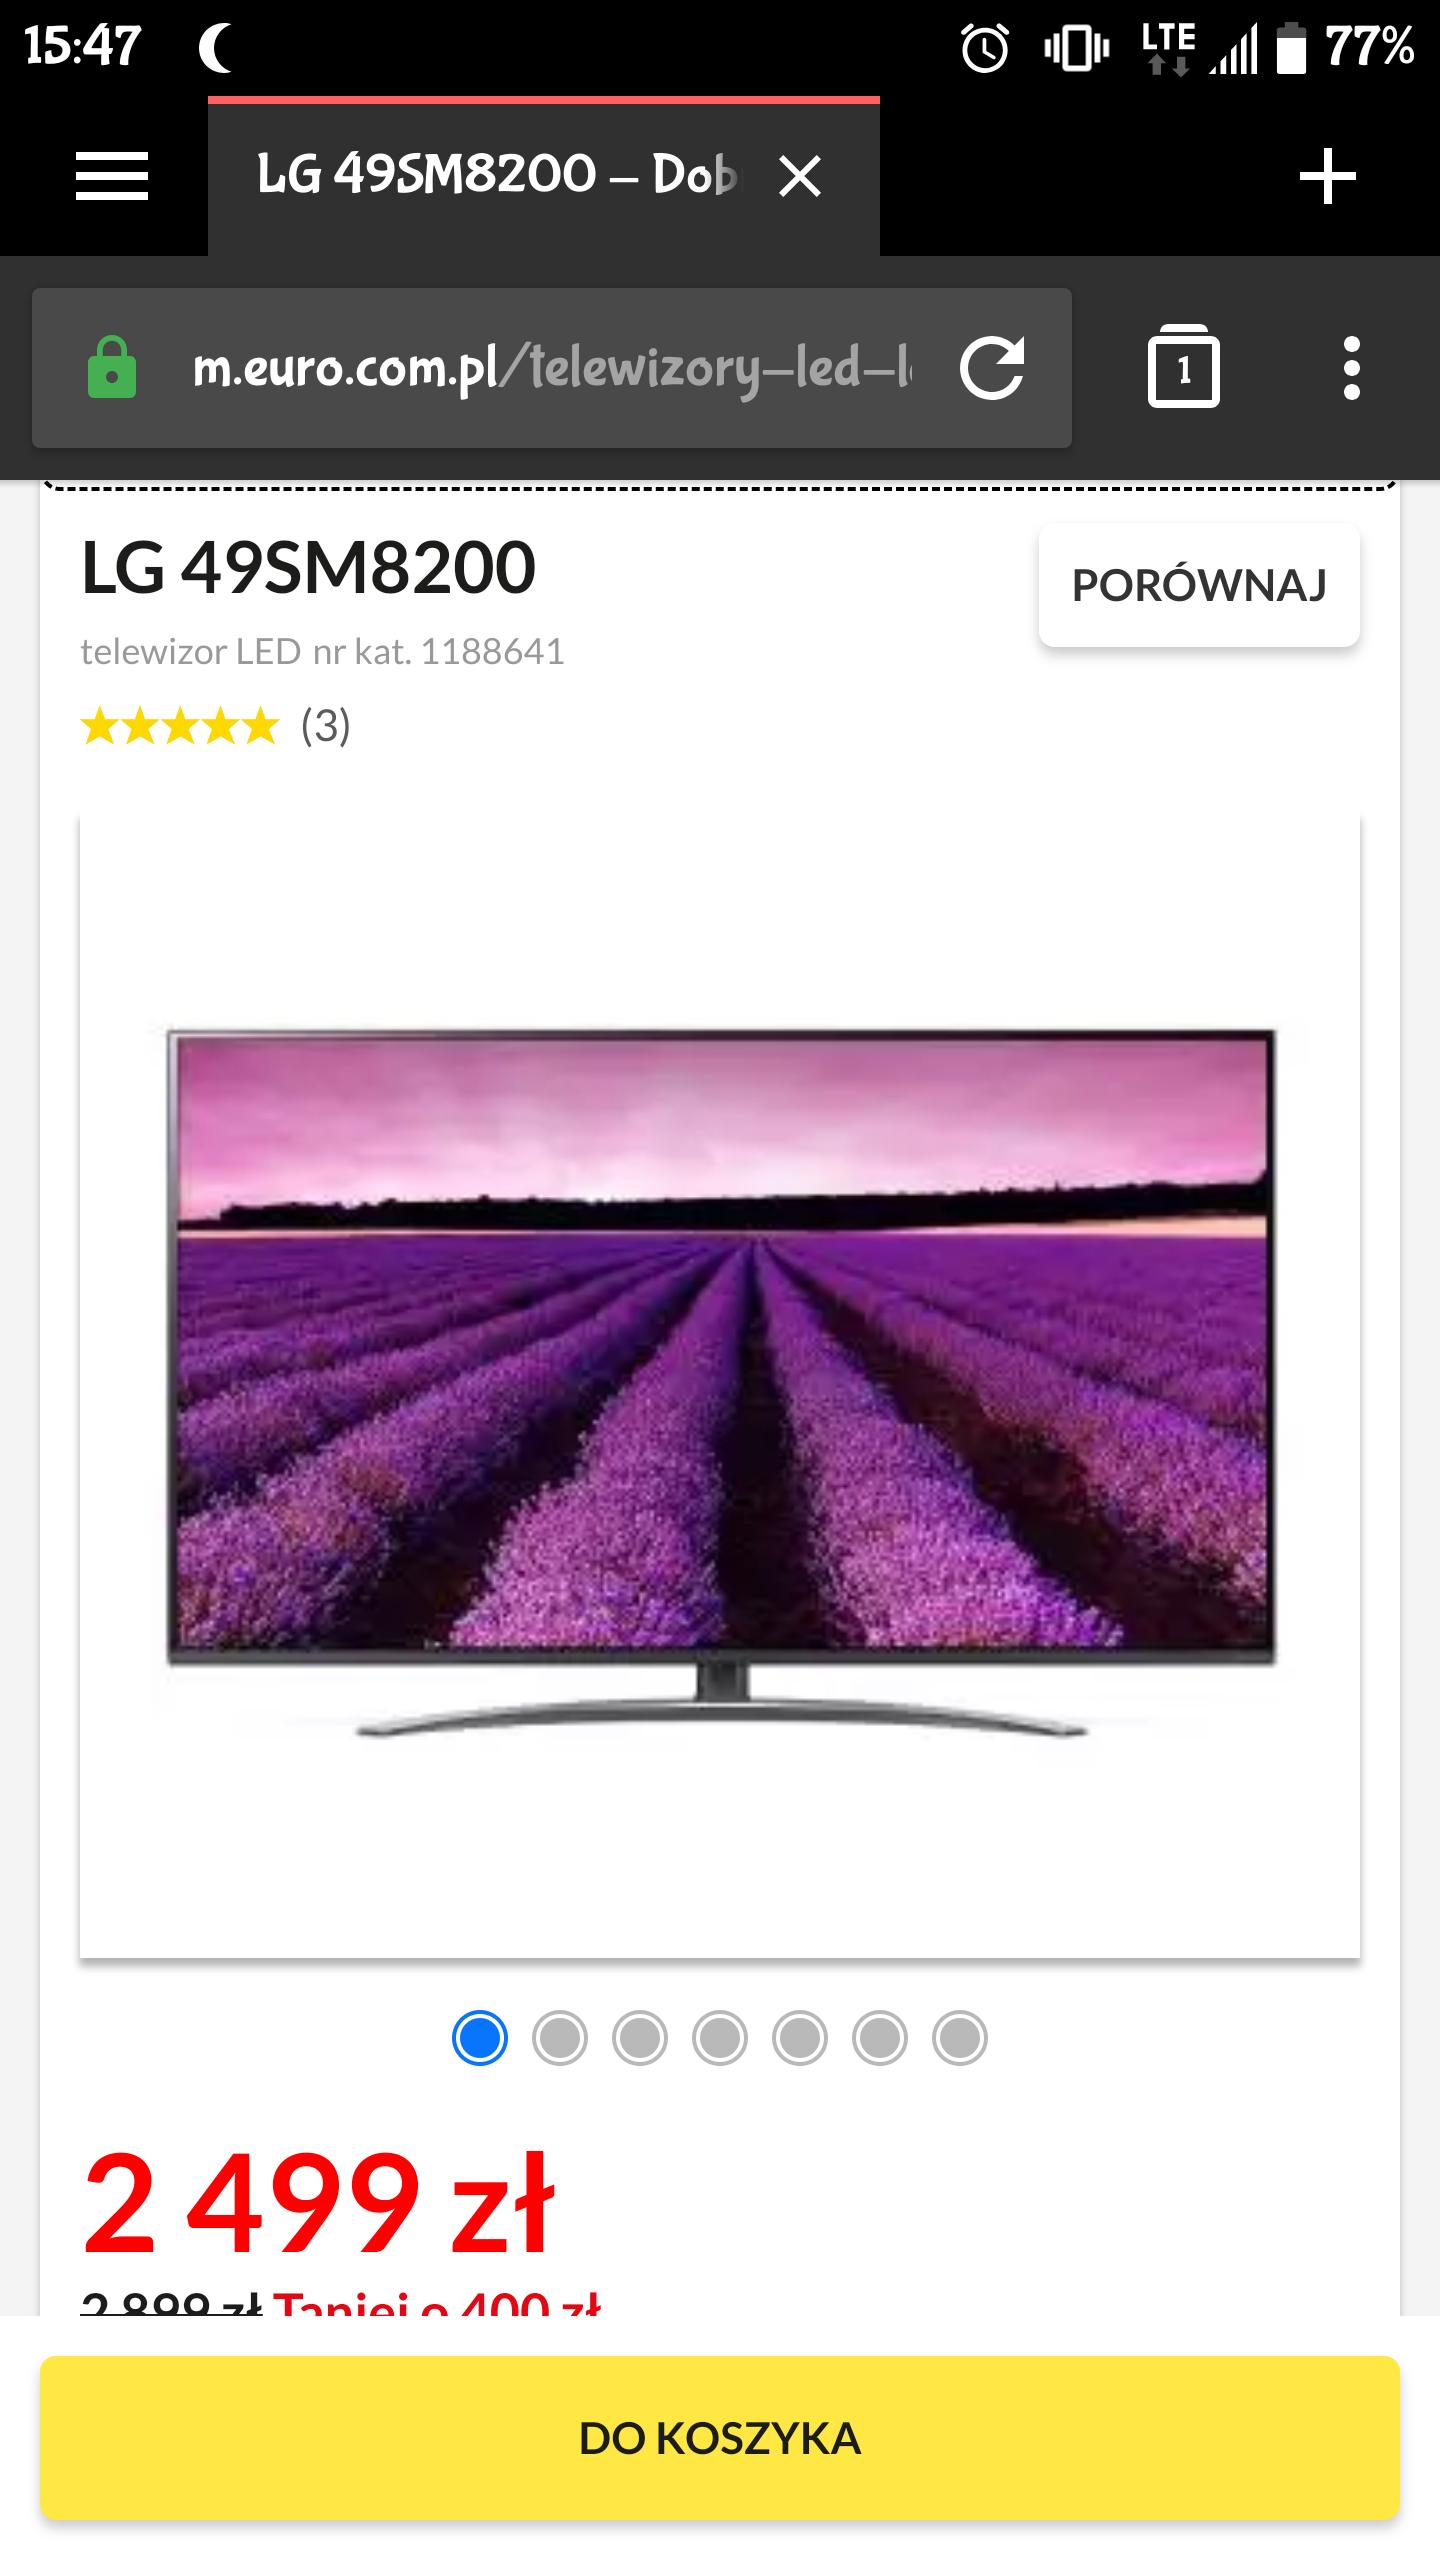 LG NanoCell TV 49SM8200 60Hz